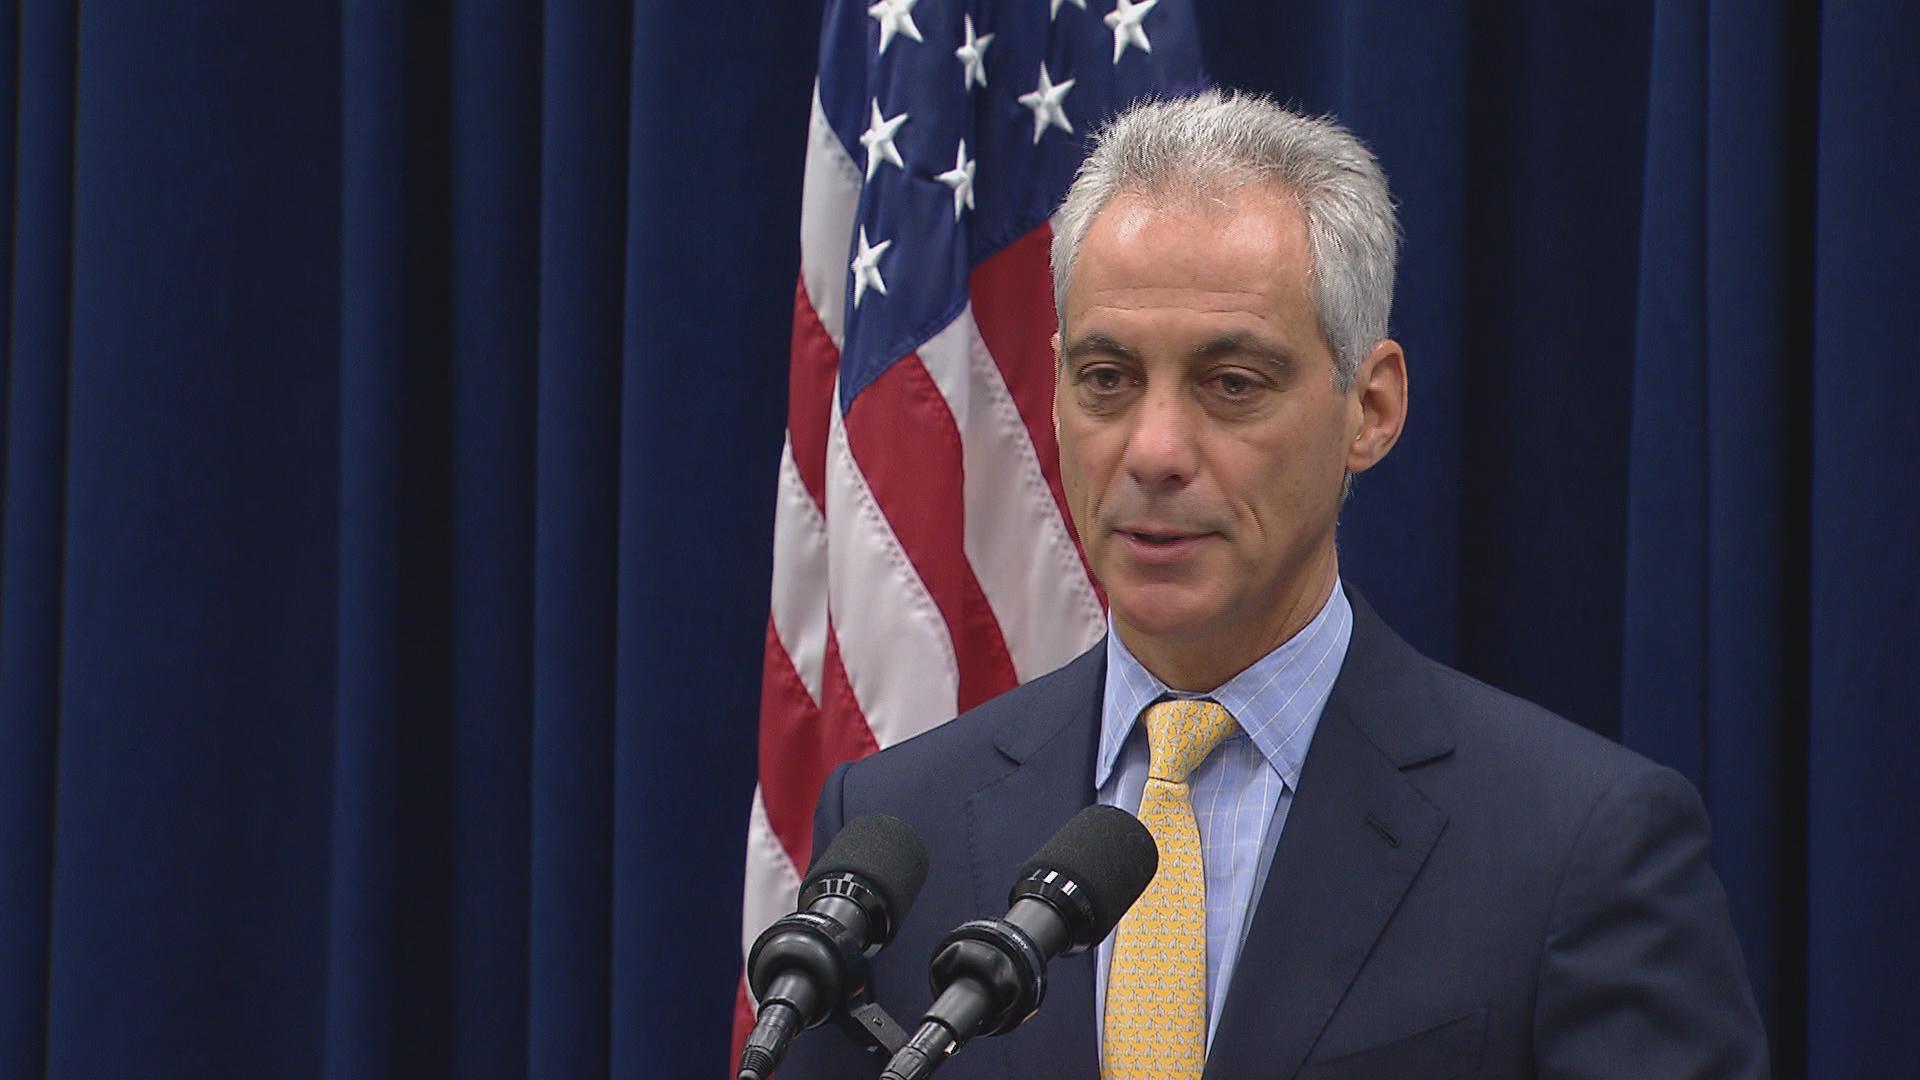 Mayor Applauds Gun Bill, But it's Stuck | Chicago News | WTTW